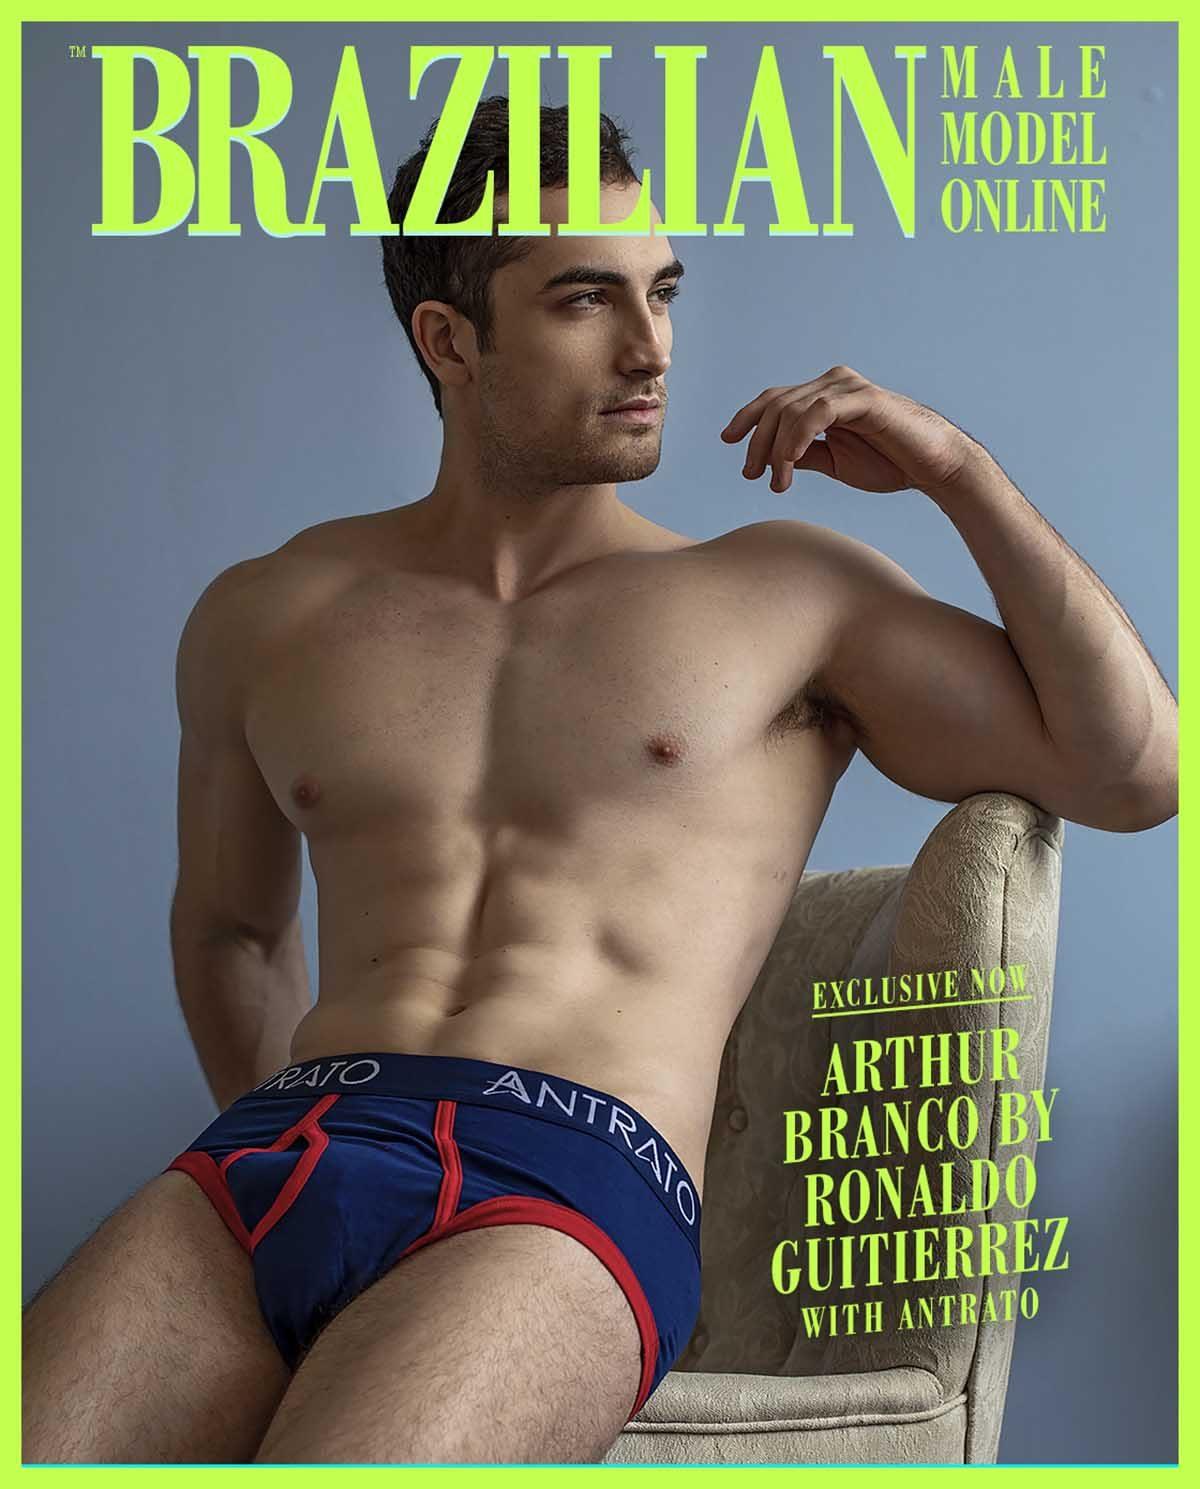 Arthur Branco by Ronaldo Gutierrez with Antrato